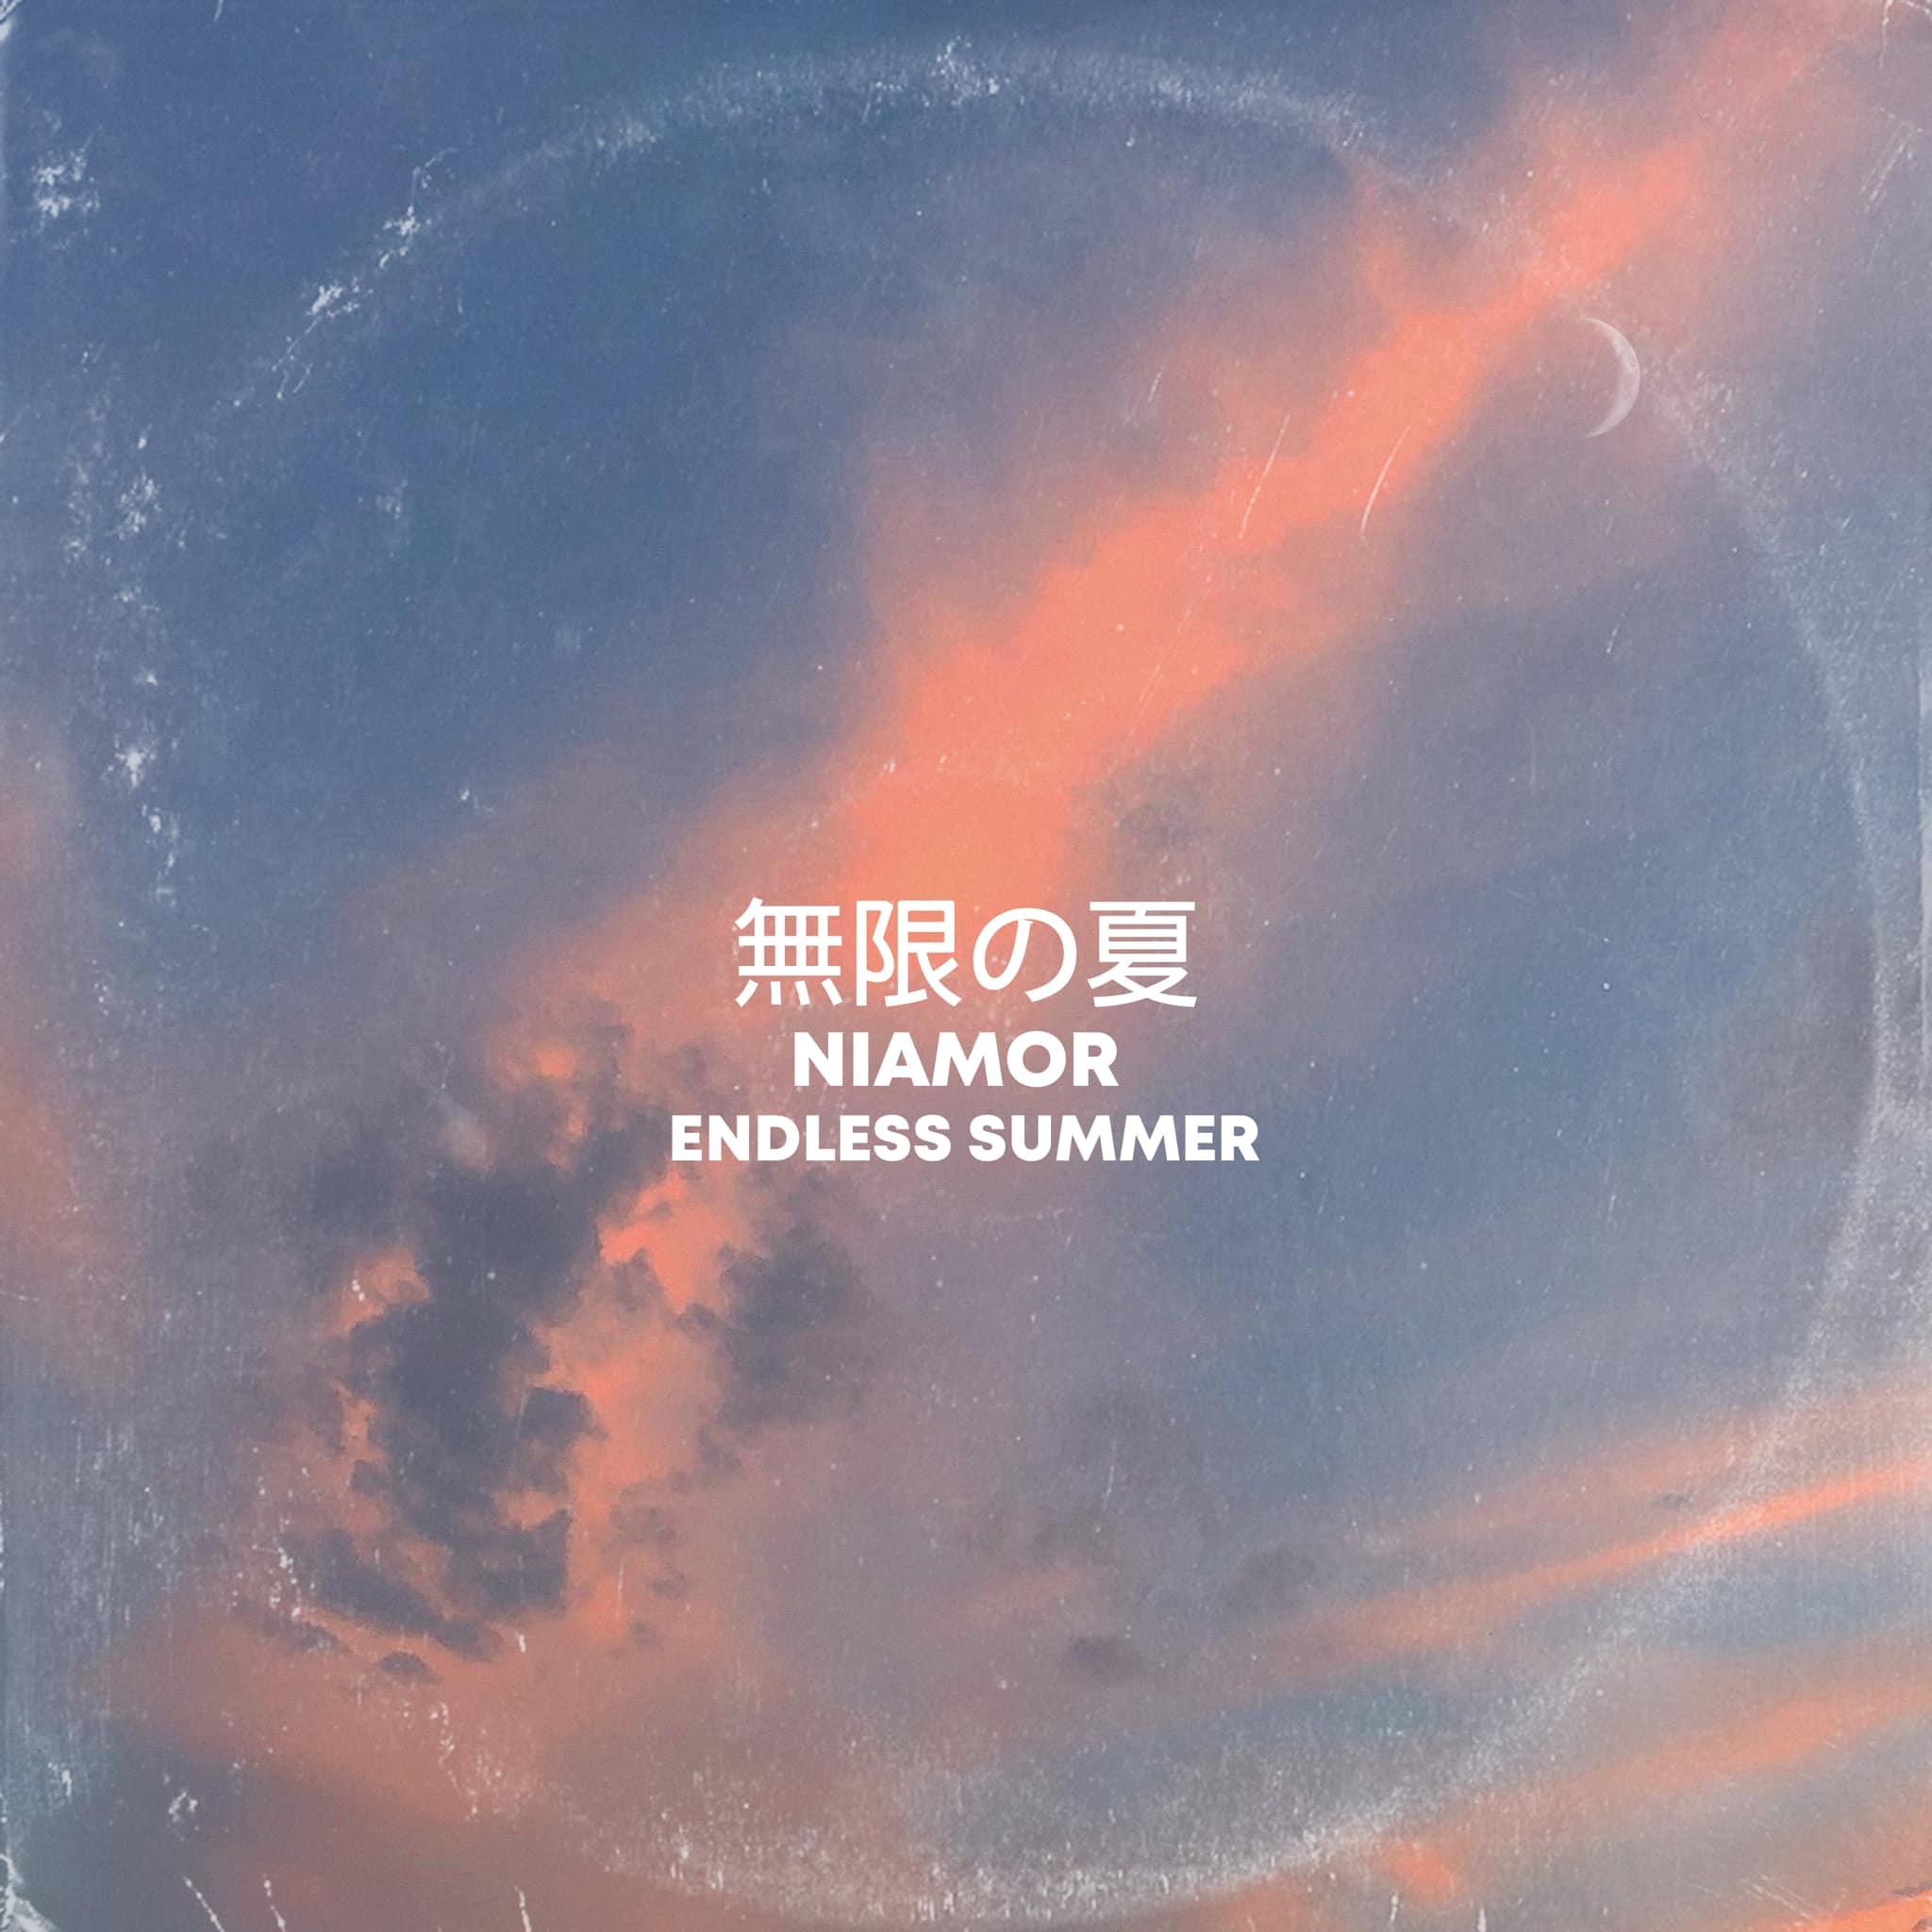 Niamor - endless summer